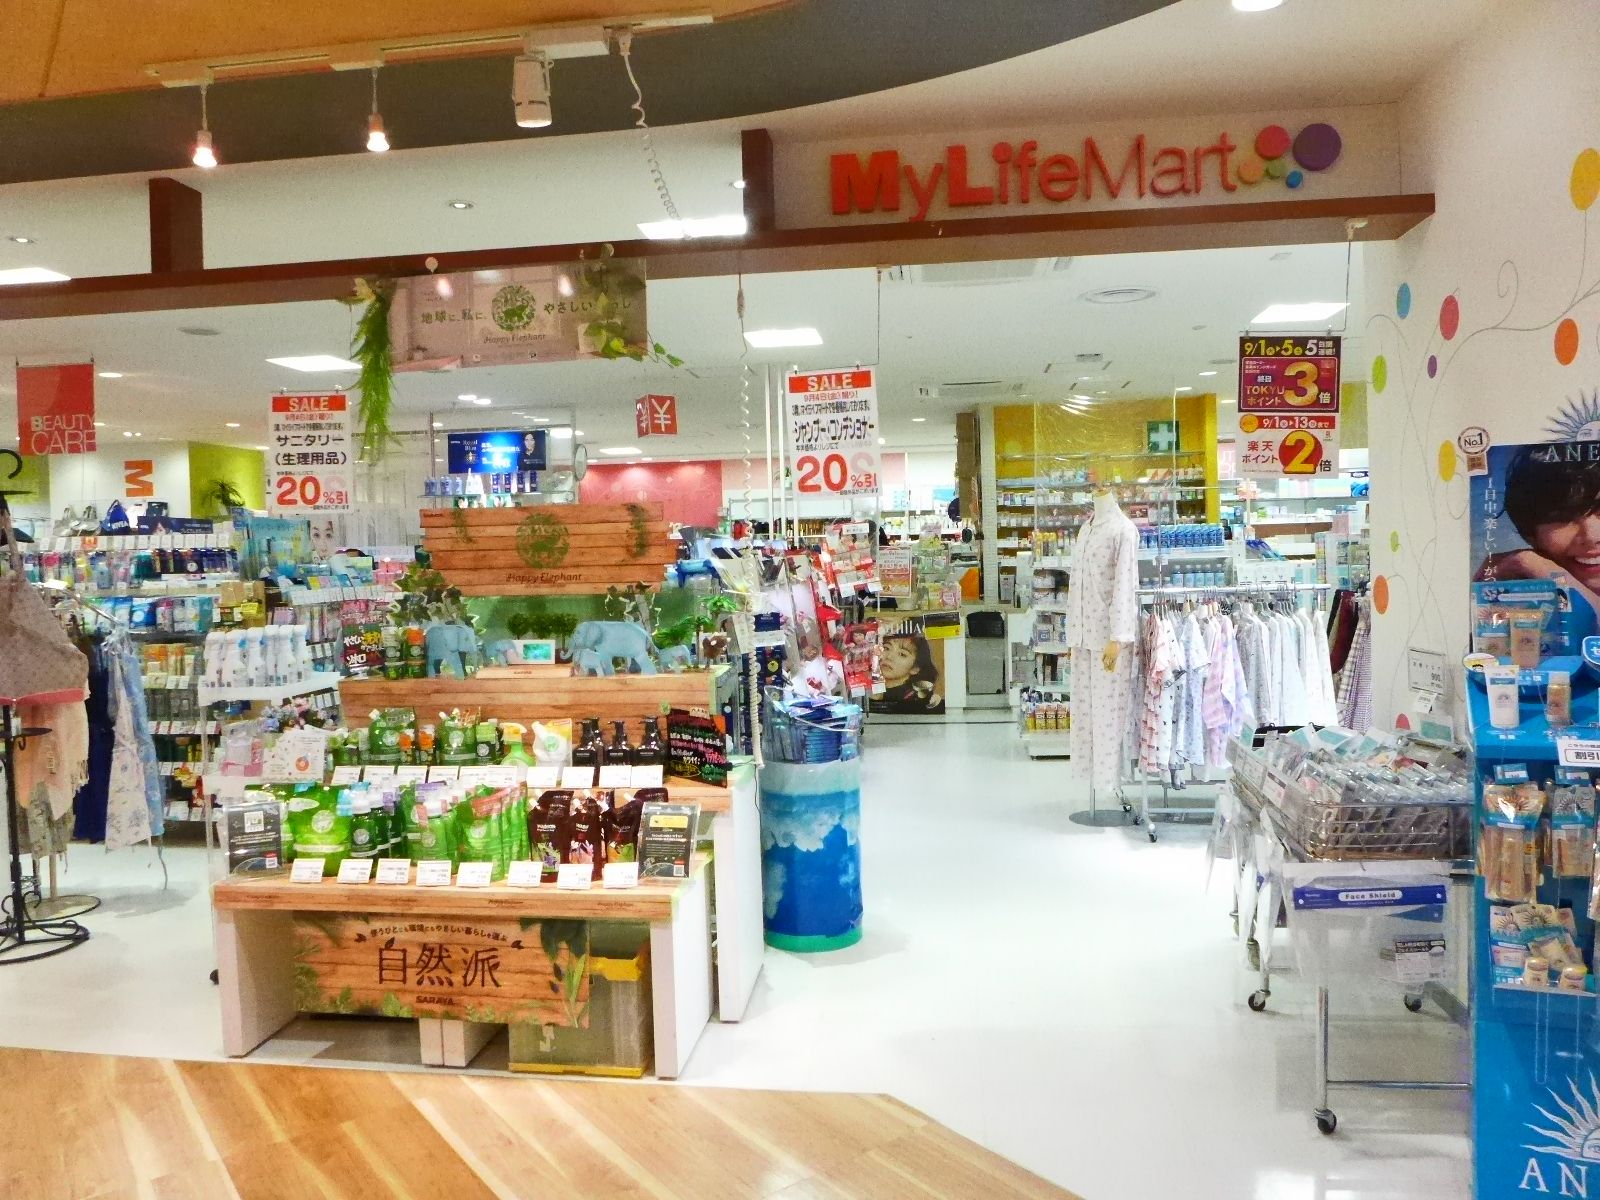 MyLifeMart,マイライフマート,自由が丘,ライフスタイルグッズ,生活雑貨,キッチン雑貨,薬,日用品